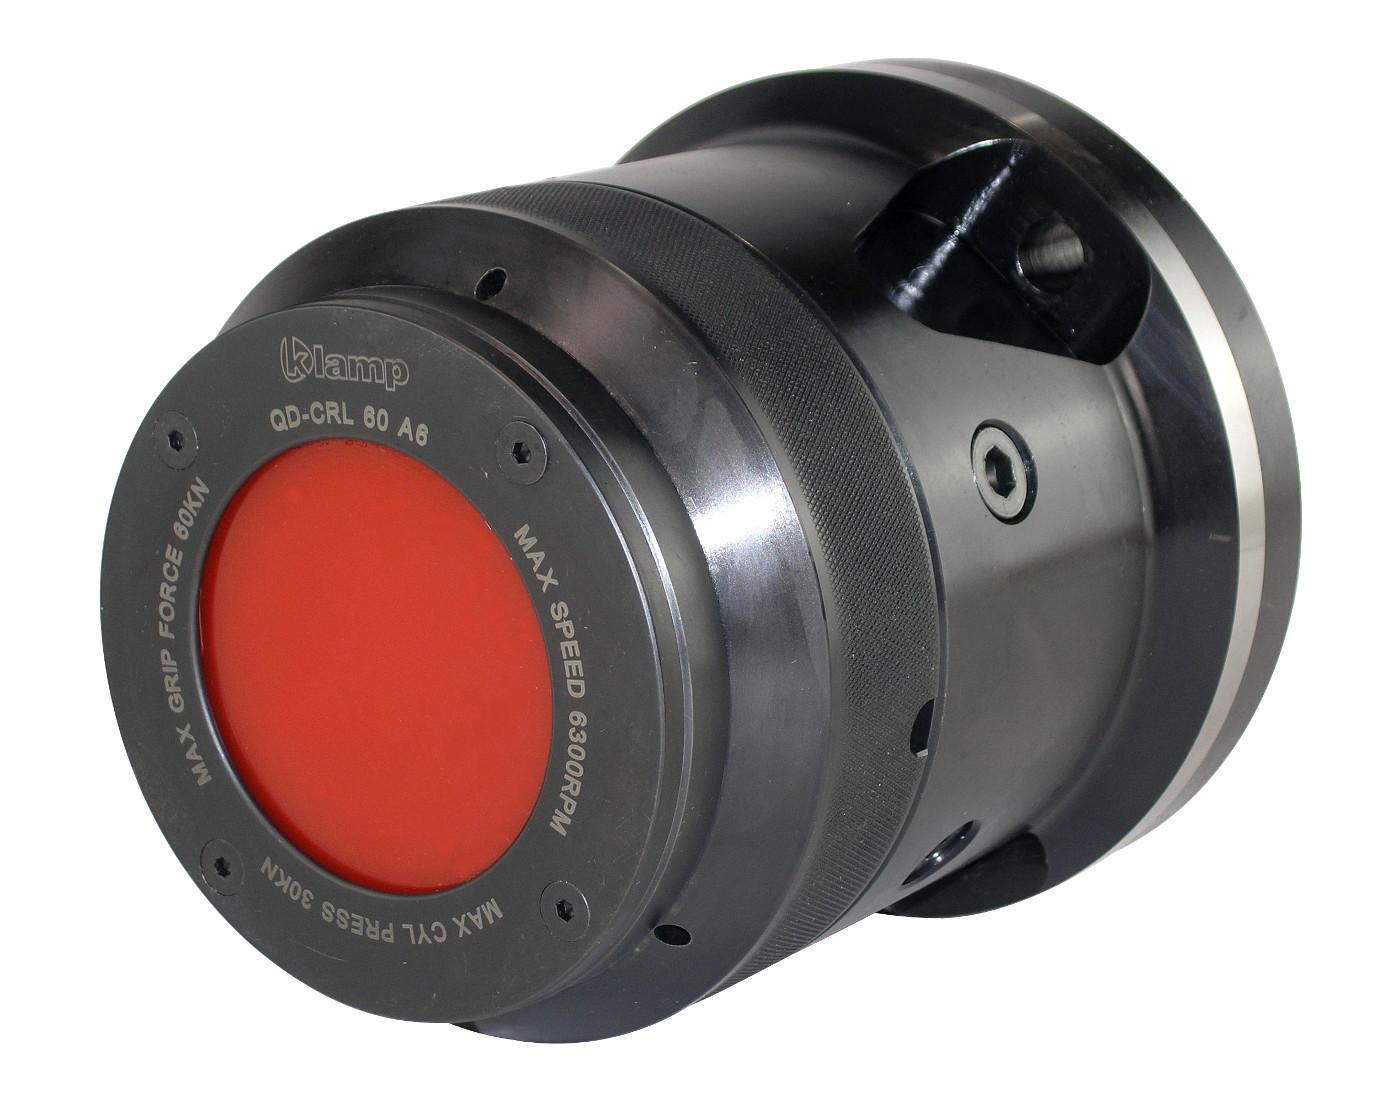 QD-CRL60